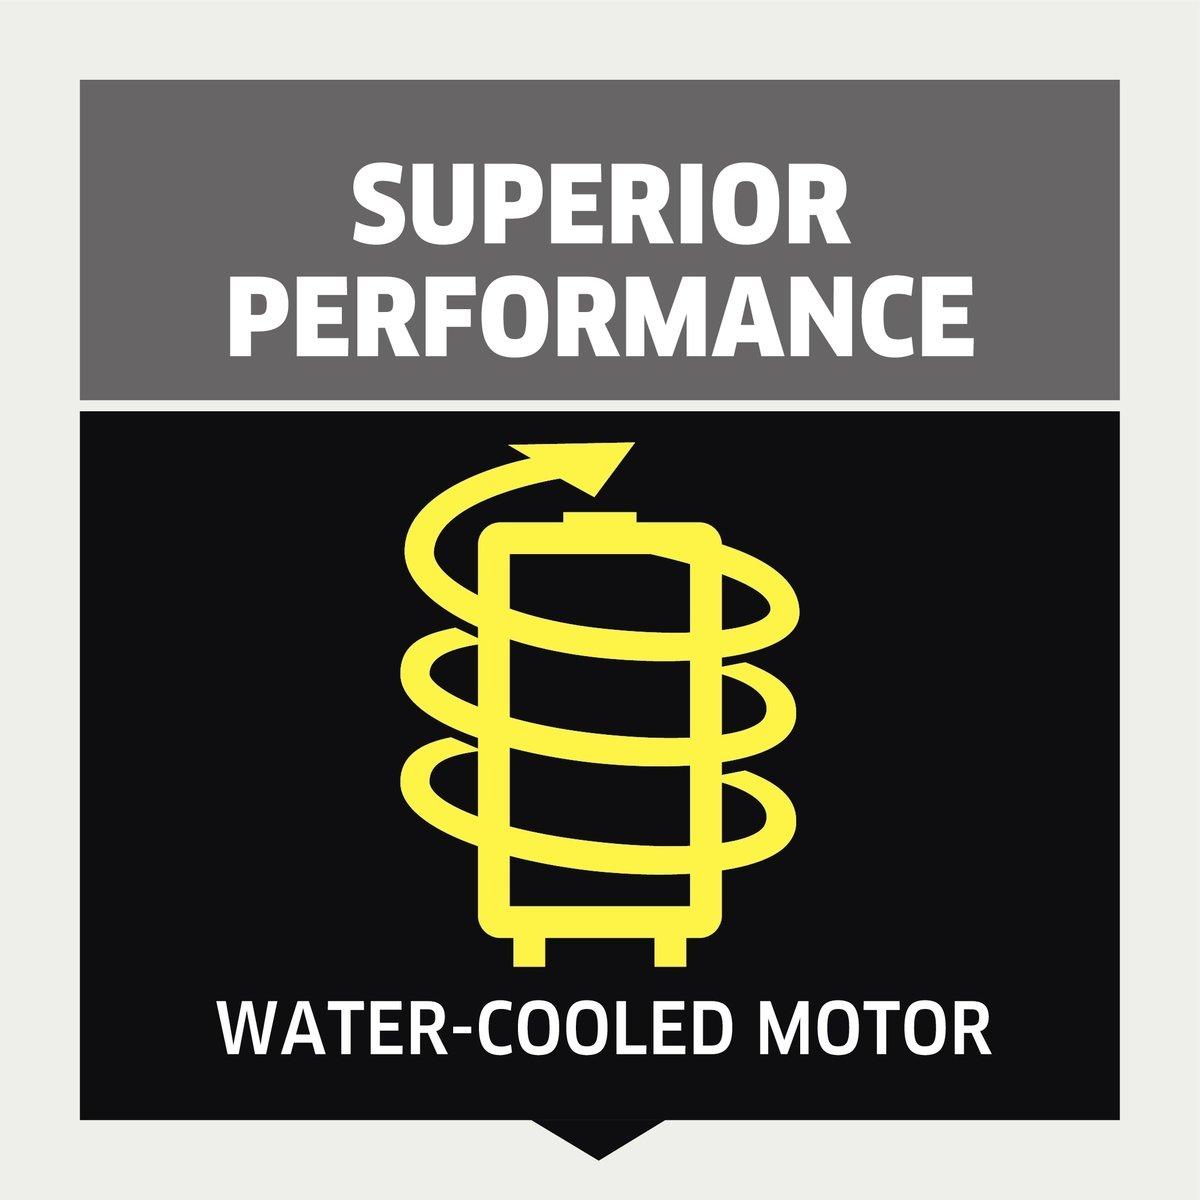 picto_WCM_superior_performance_bottom_oth_1_EN_CI15502x502